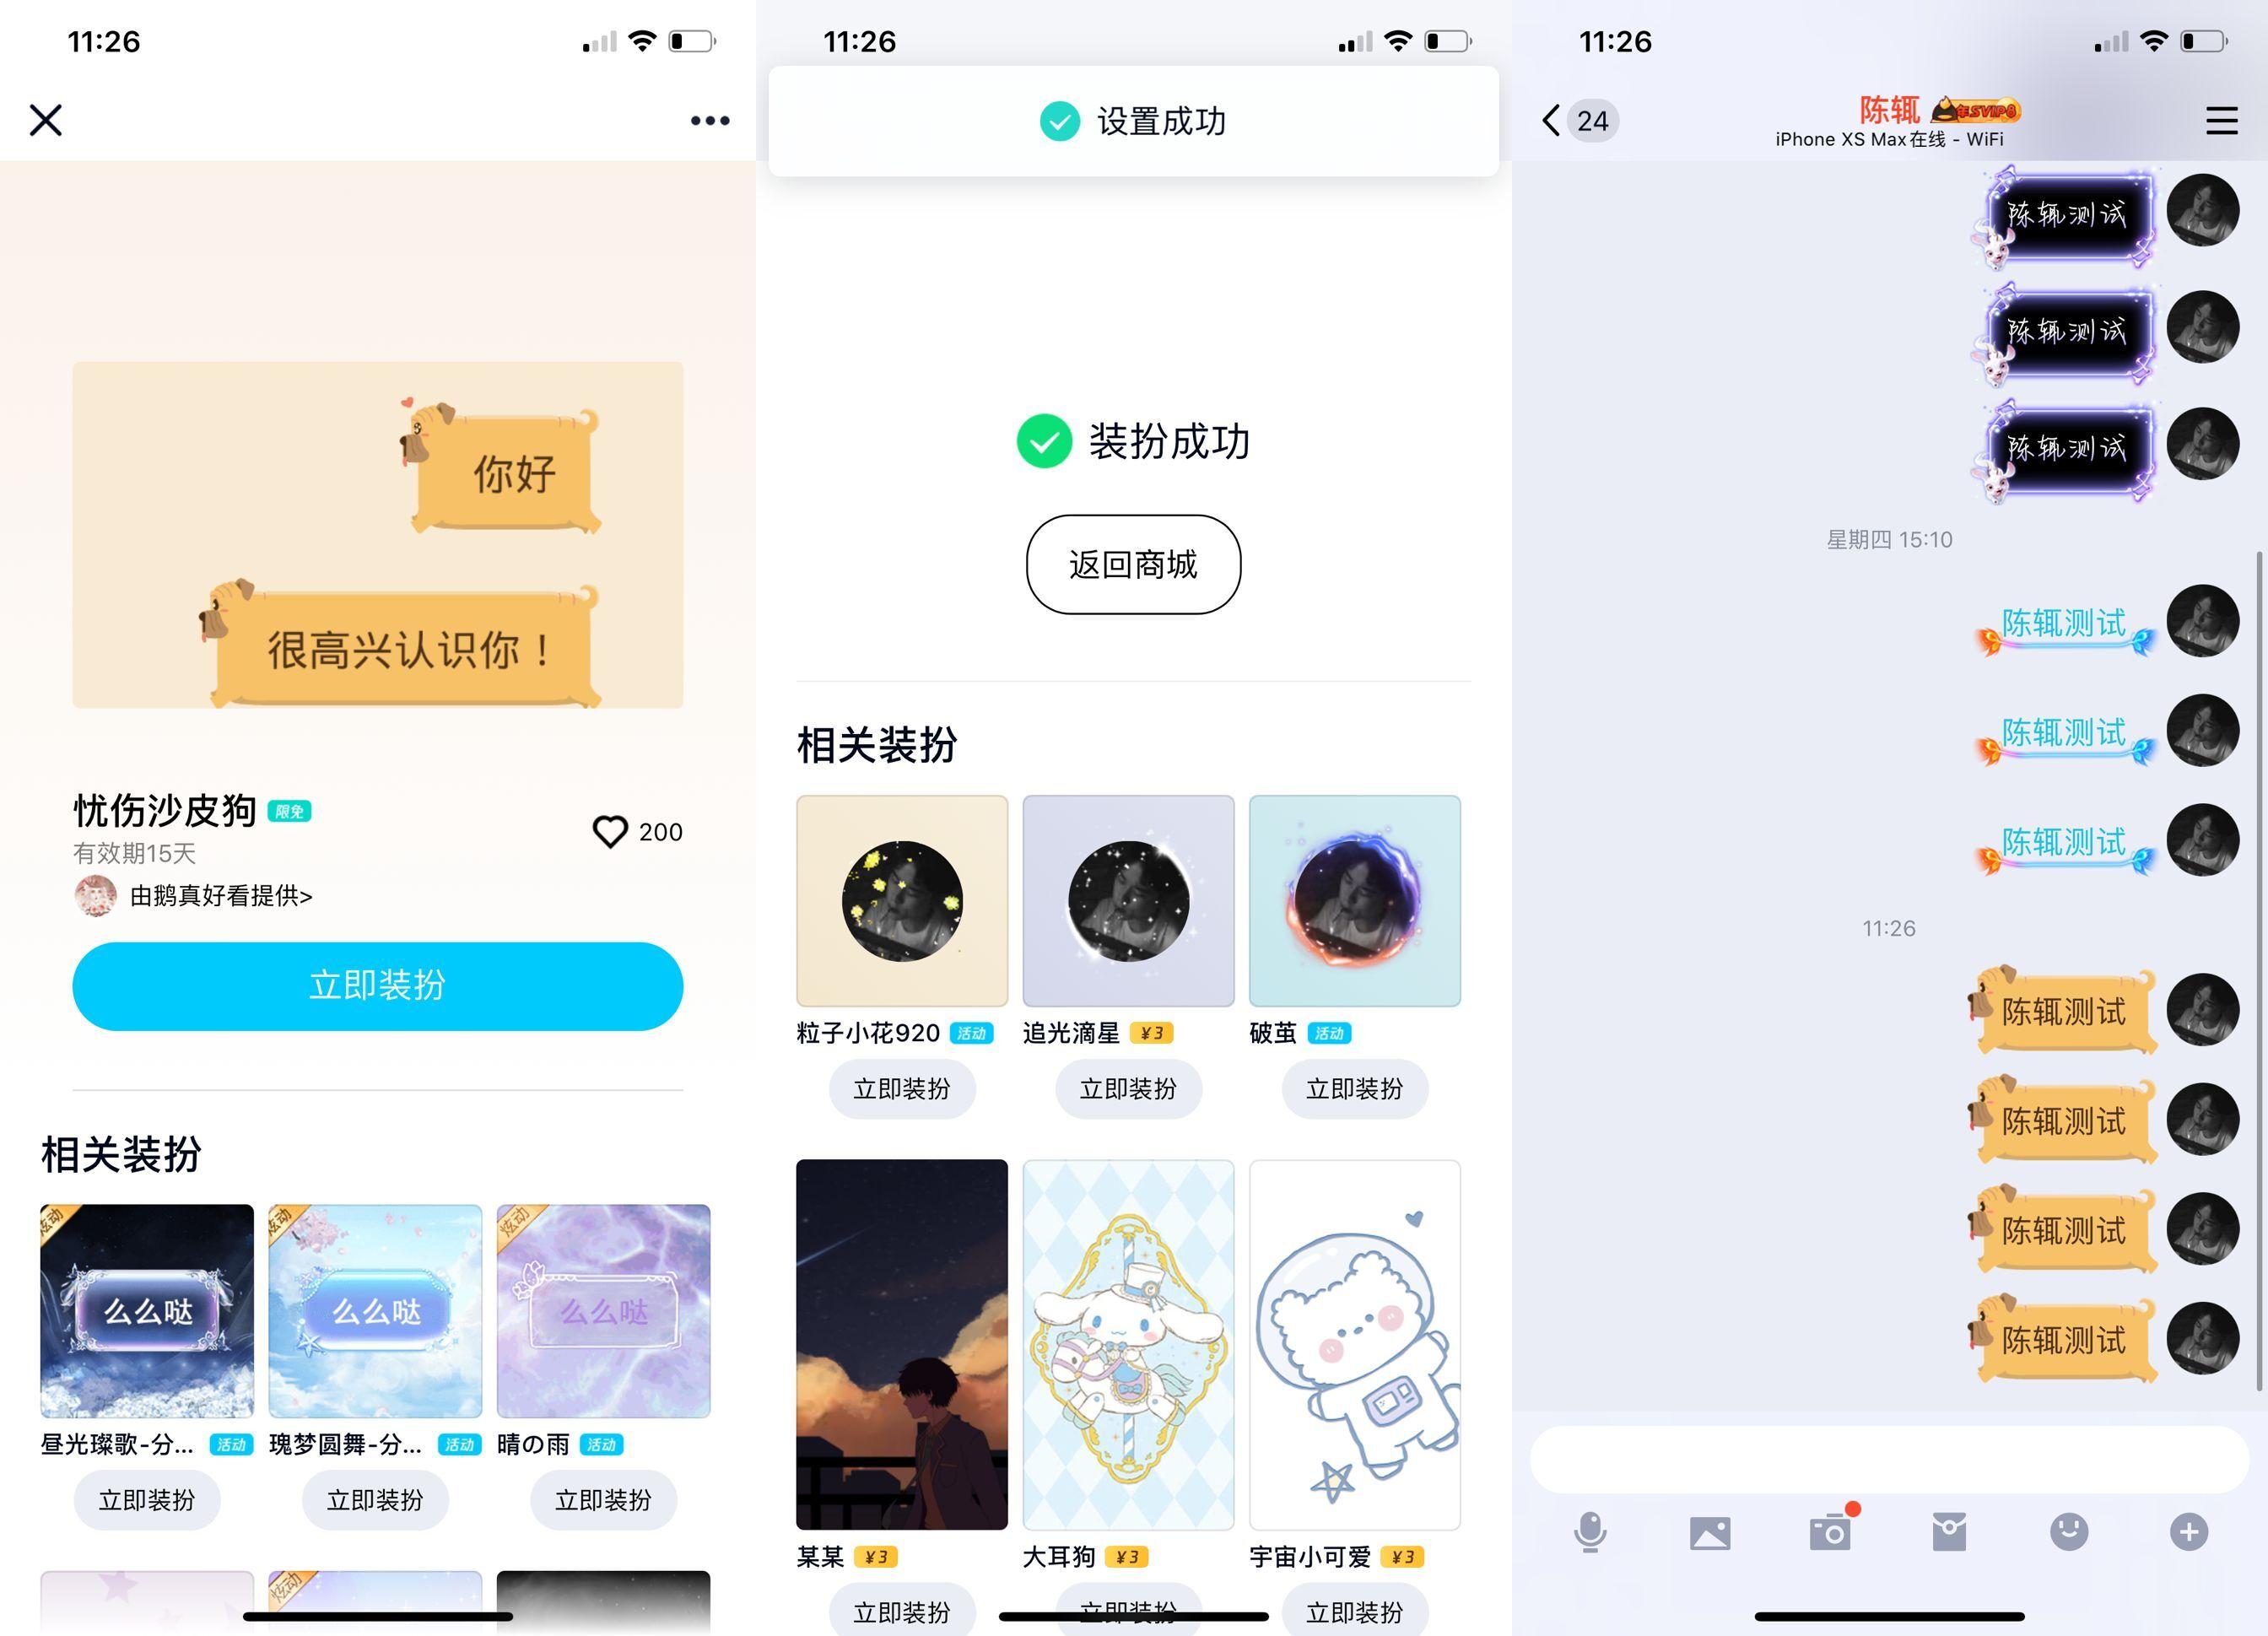 QQ最新一期忧伤沙皮狗气泡免费装扮